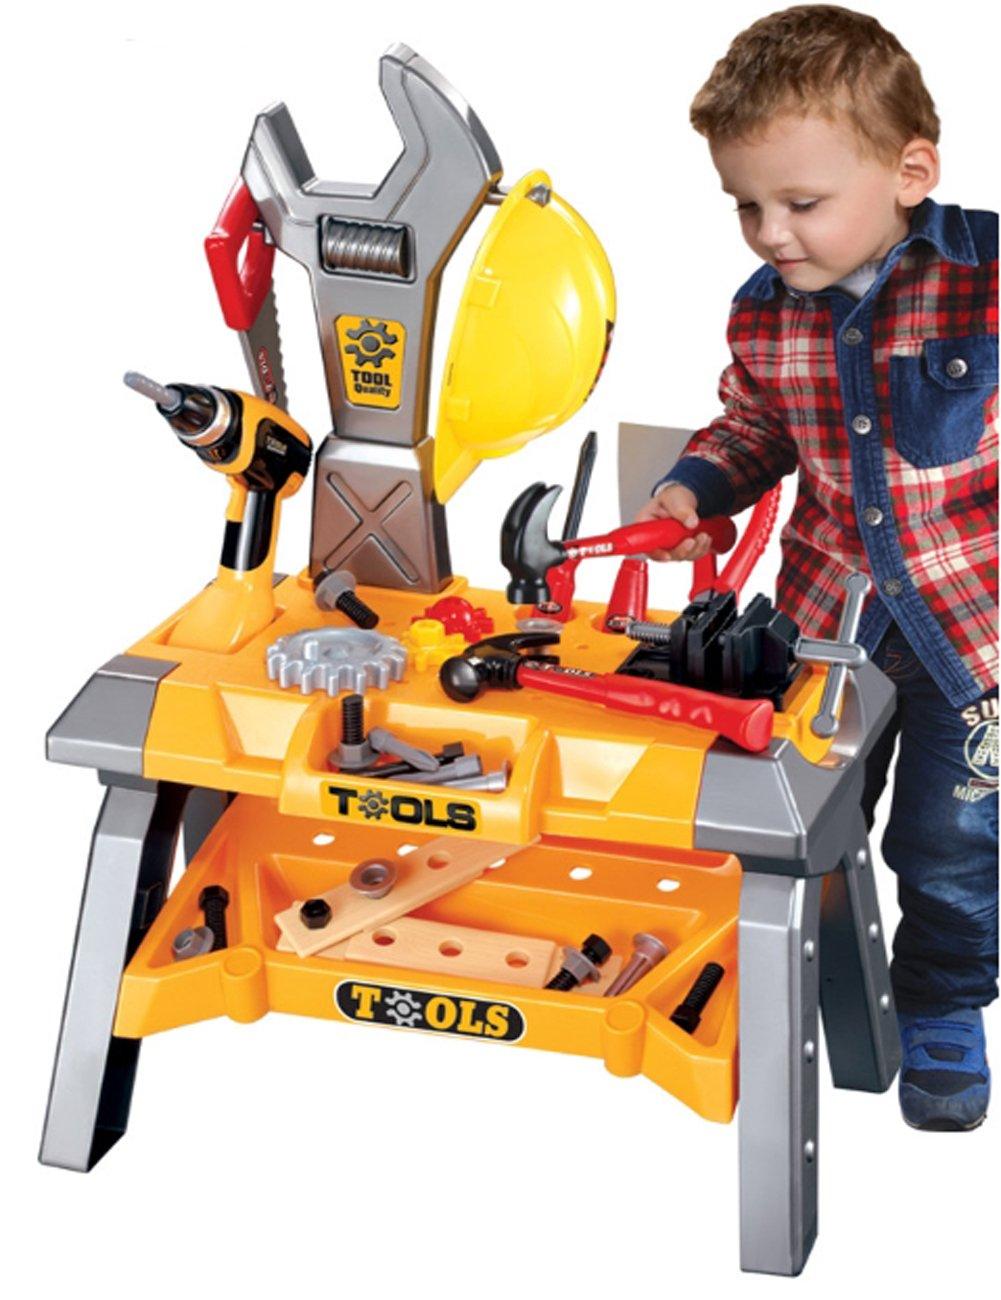 Superior Tools Play Set 折りたたみ工具、大工セット、ツールボックス、ロールプレイ(海外直送品)   B06XTK9Q8G